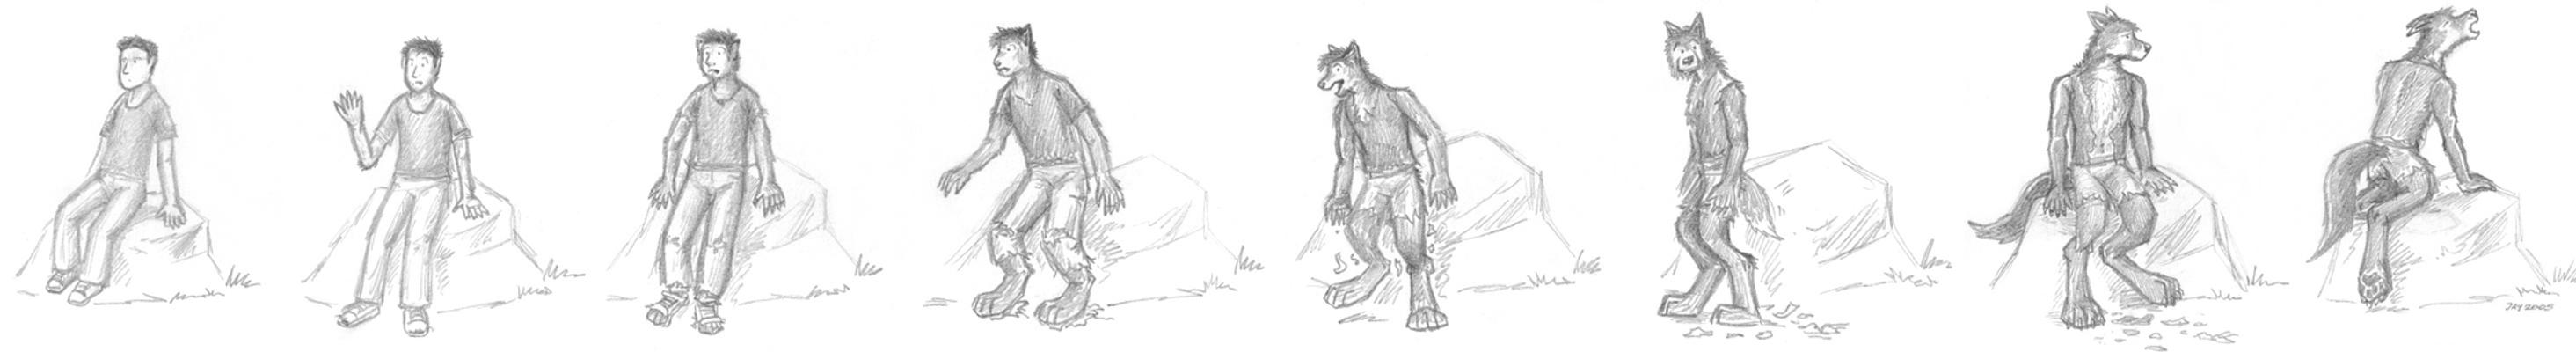 Reluctant Werewolf by wannabemustangjockey